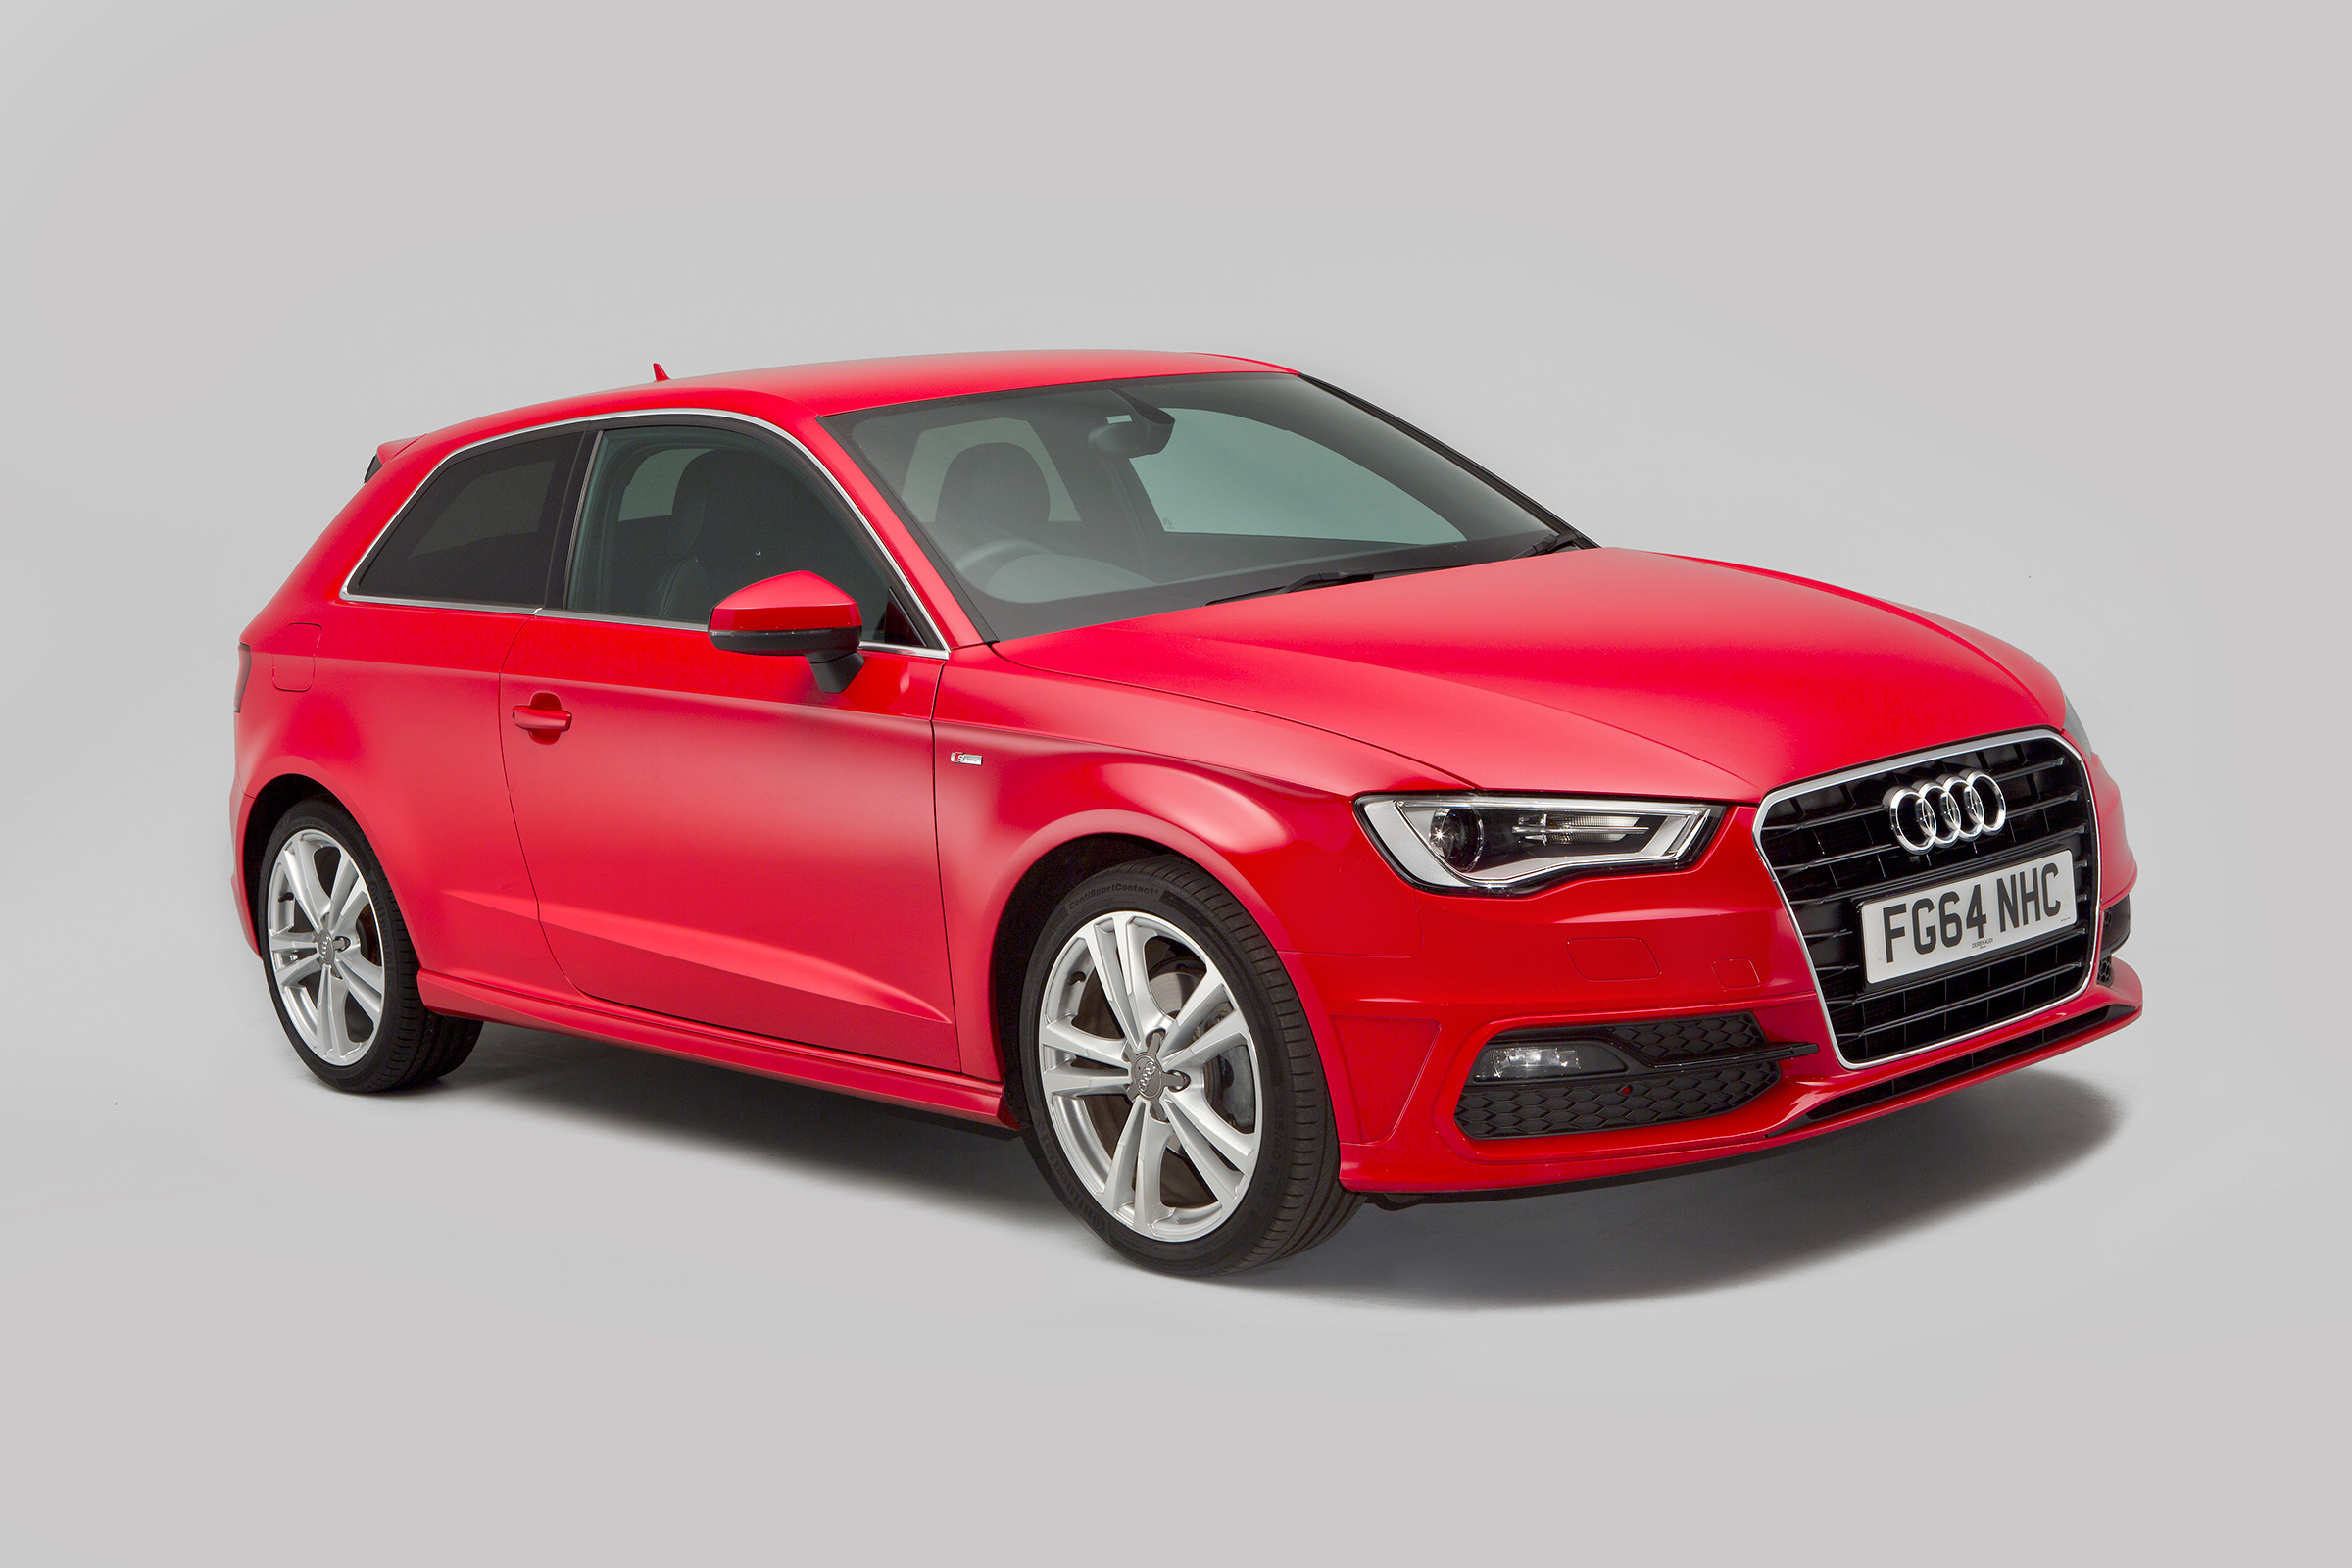 Kekurangan Audi 13 Spesifikasi